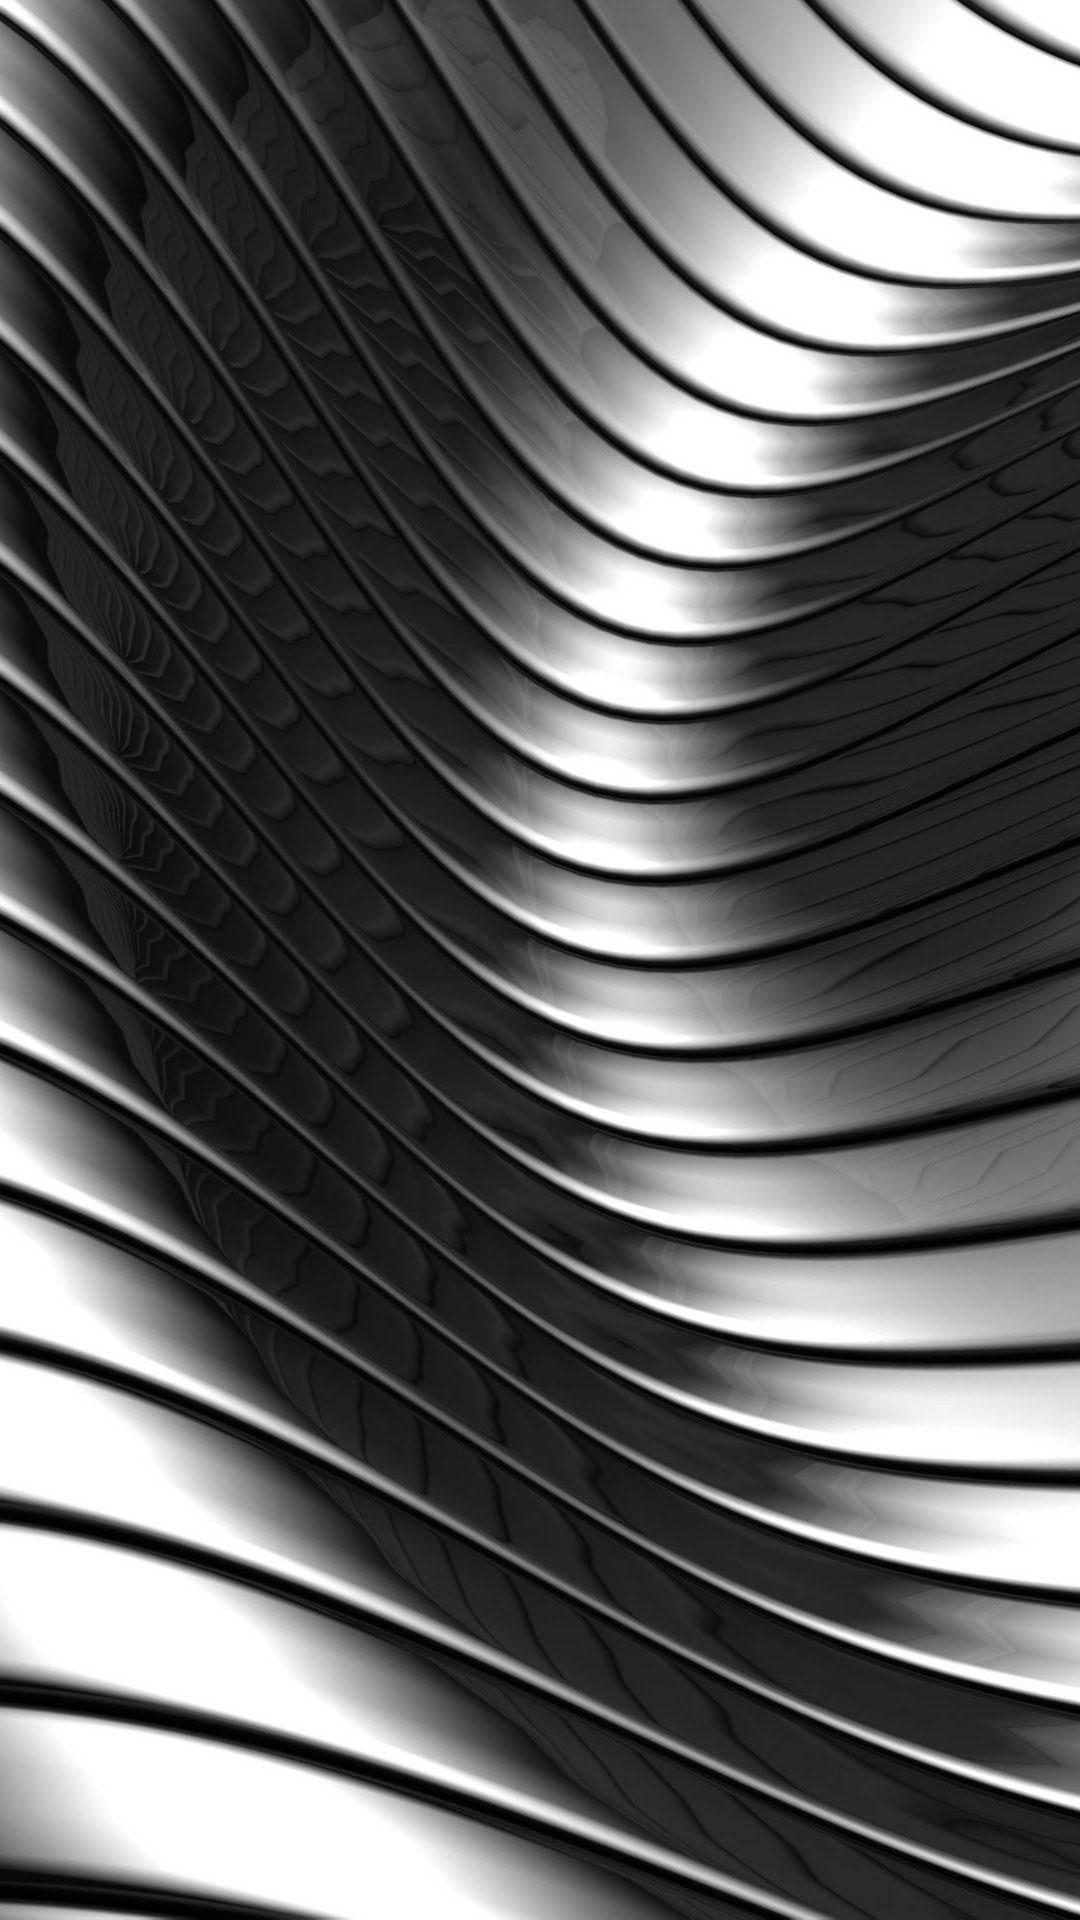 Free Metal Wallpaper For Smartphone